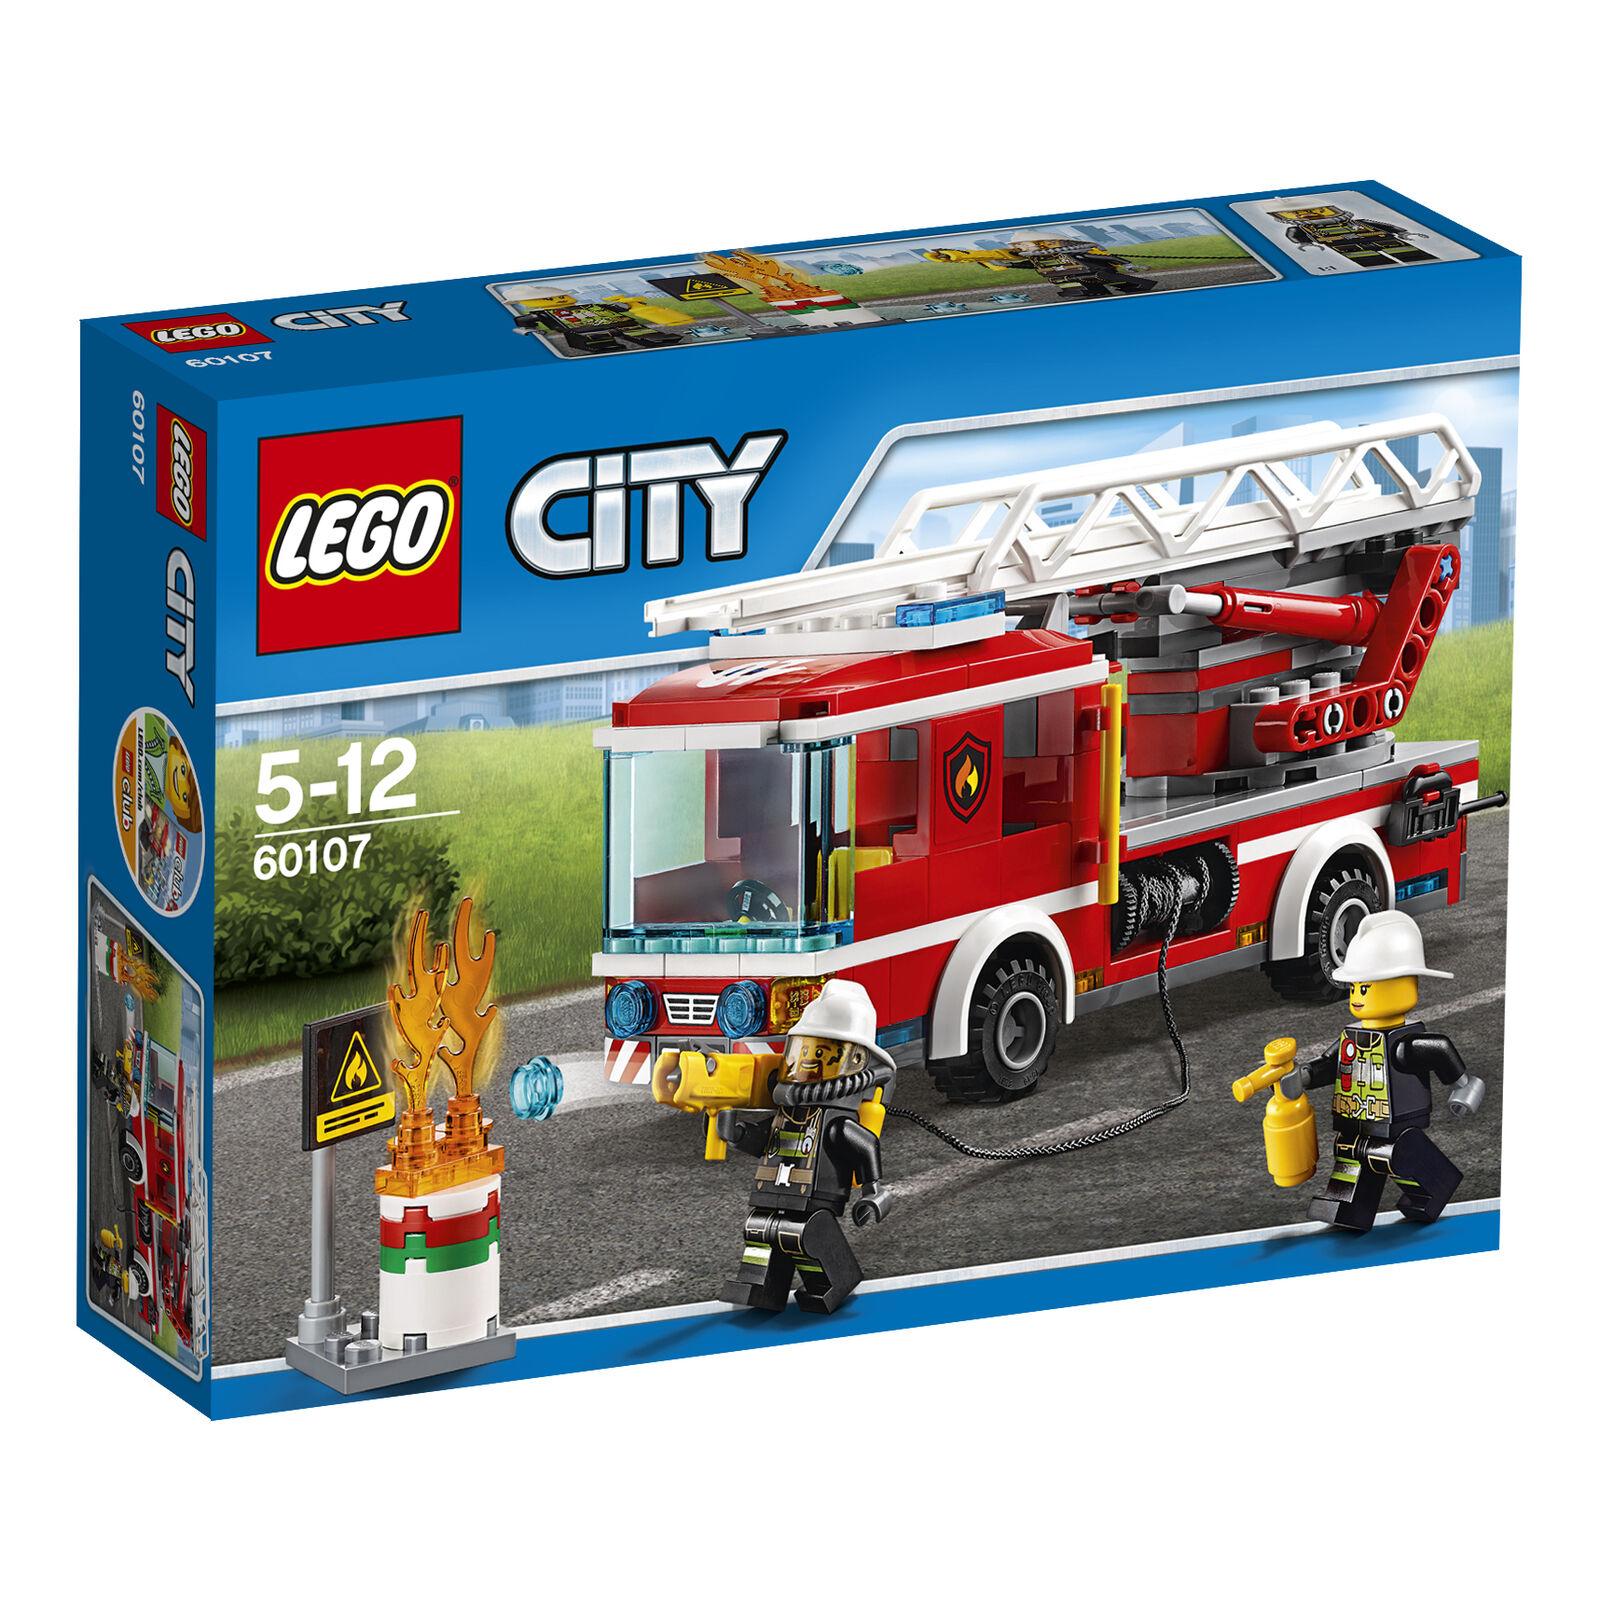 LEGO® City 60107 Feuerwehrfahrzeug mit fahrbarer Leiter NEU OVP_ NEW MISB NRFB